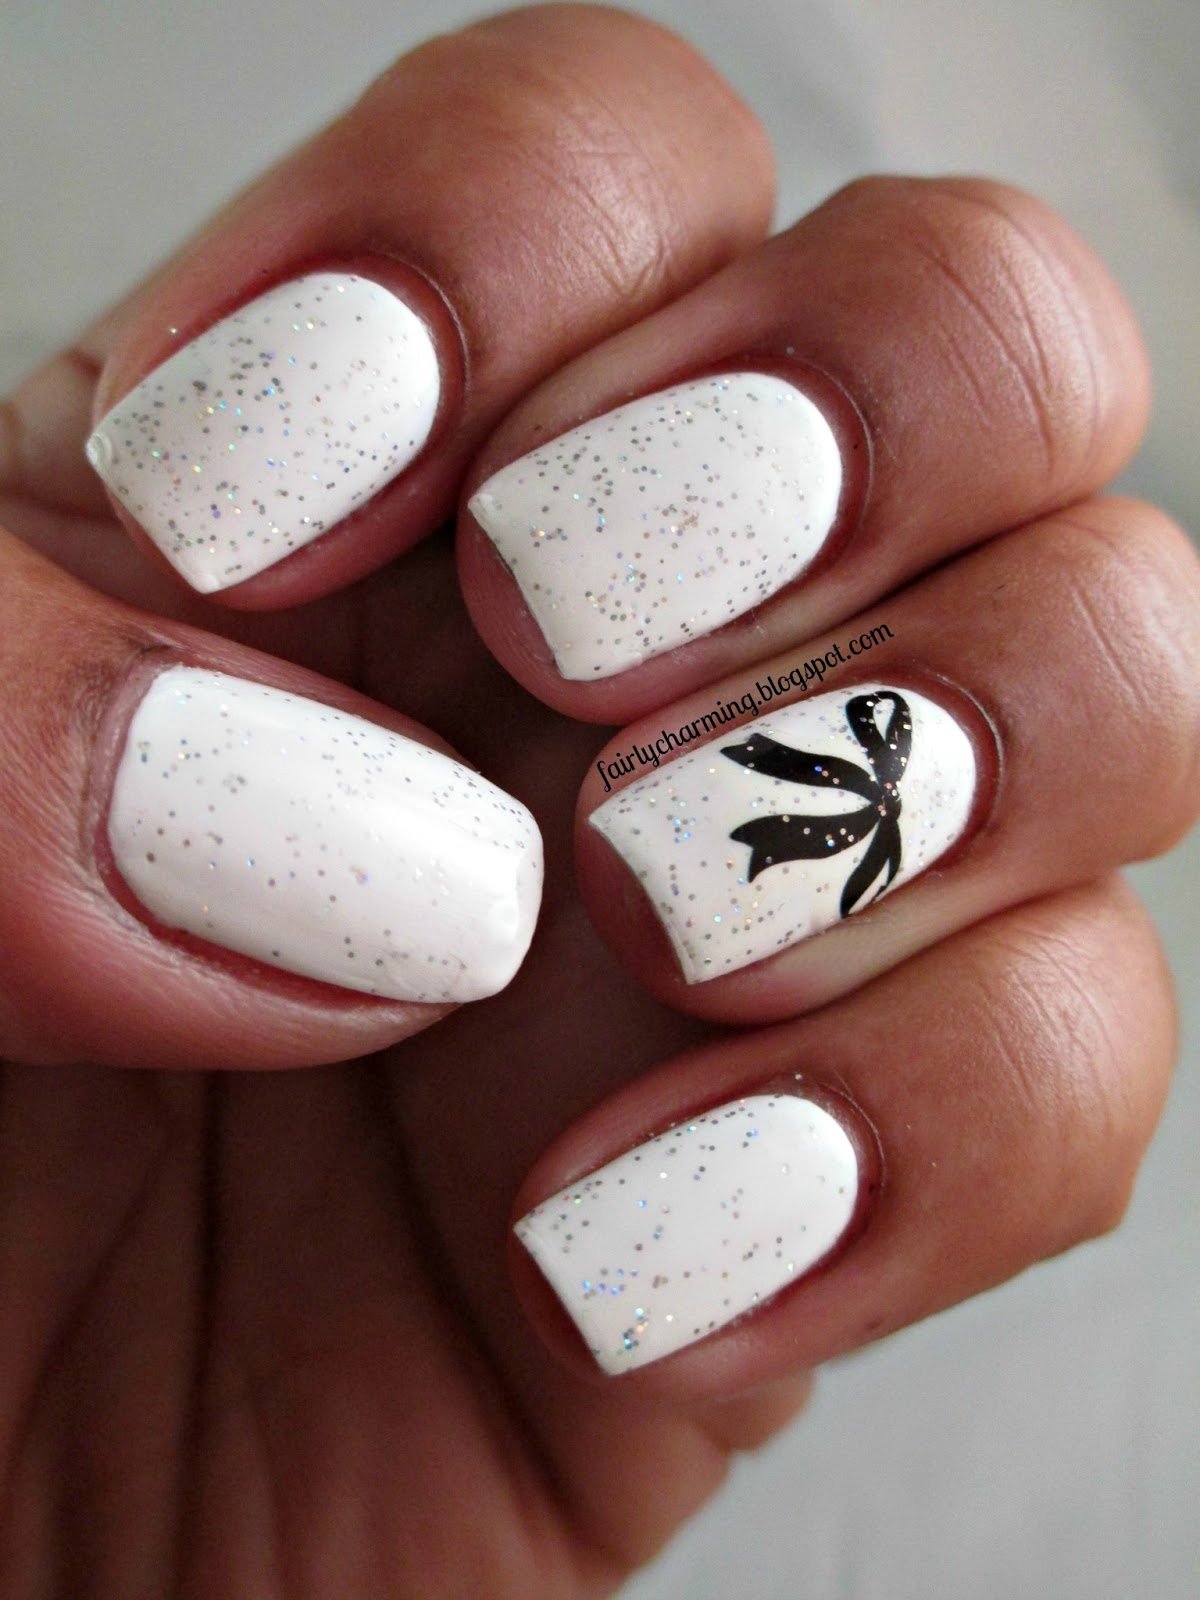 Fairly Charming: H&M Nail Tattoo